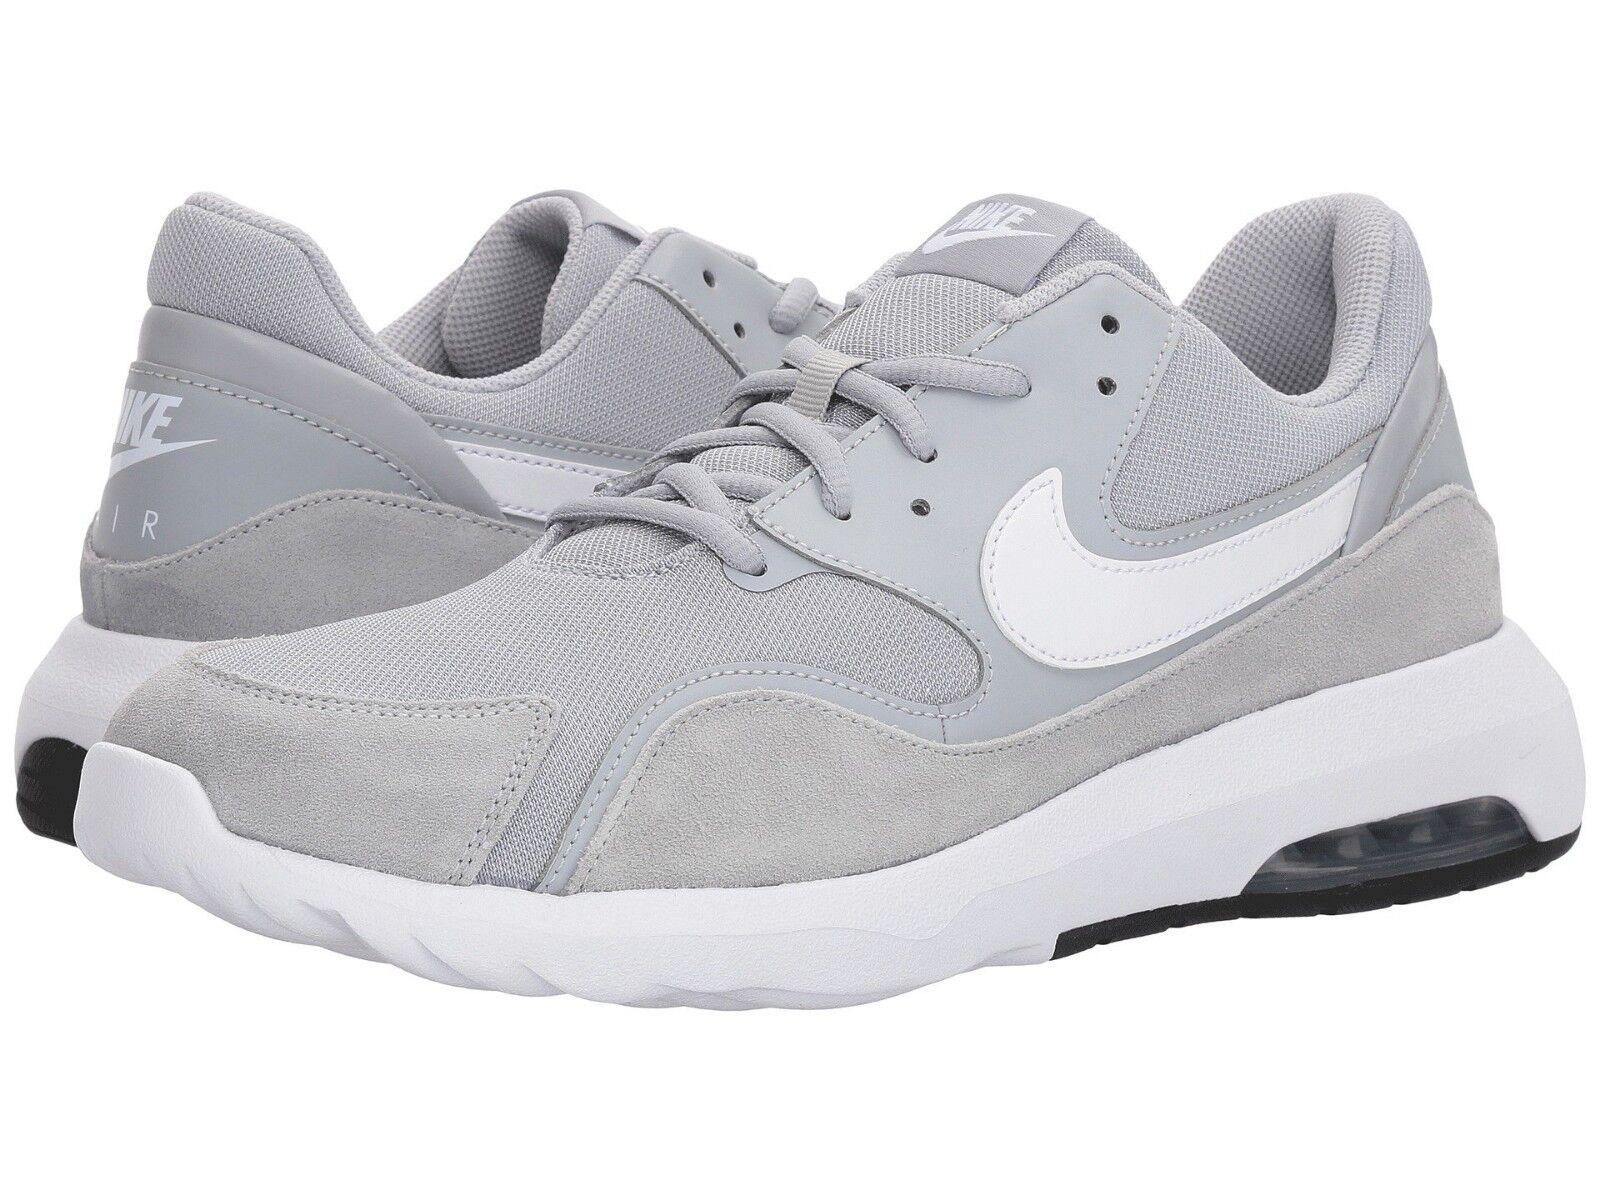 916781-001 Nike Air Max Nostalgic Running scarpe Wolf grigio Dimensiones 8-12 NIB